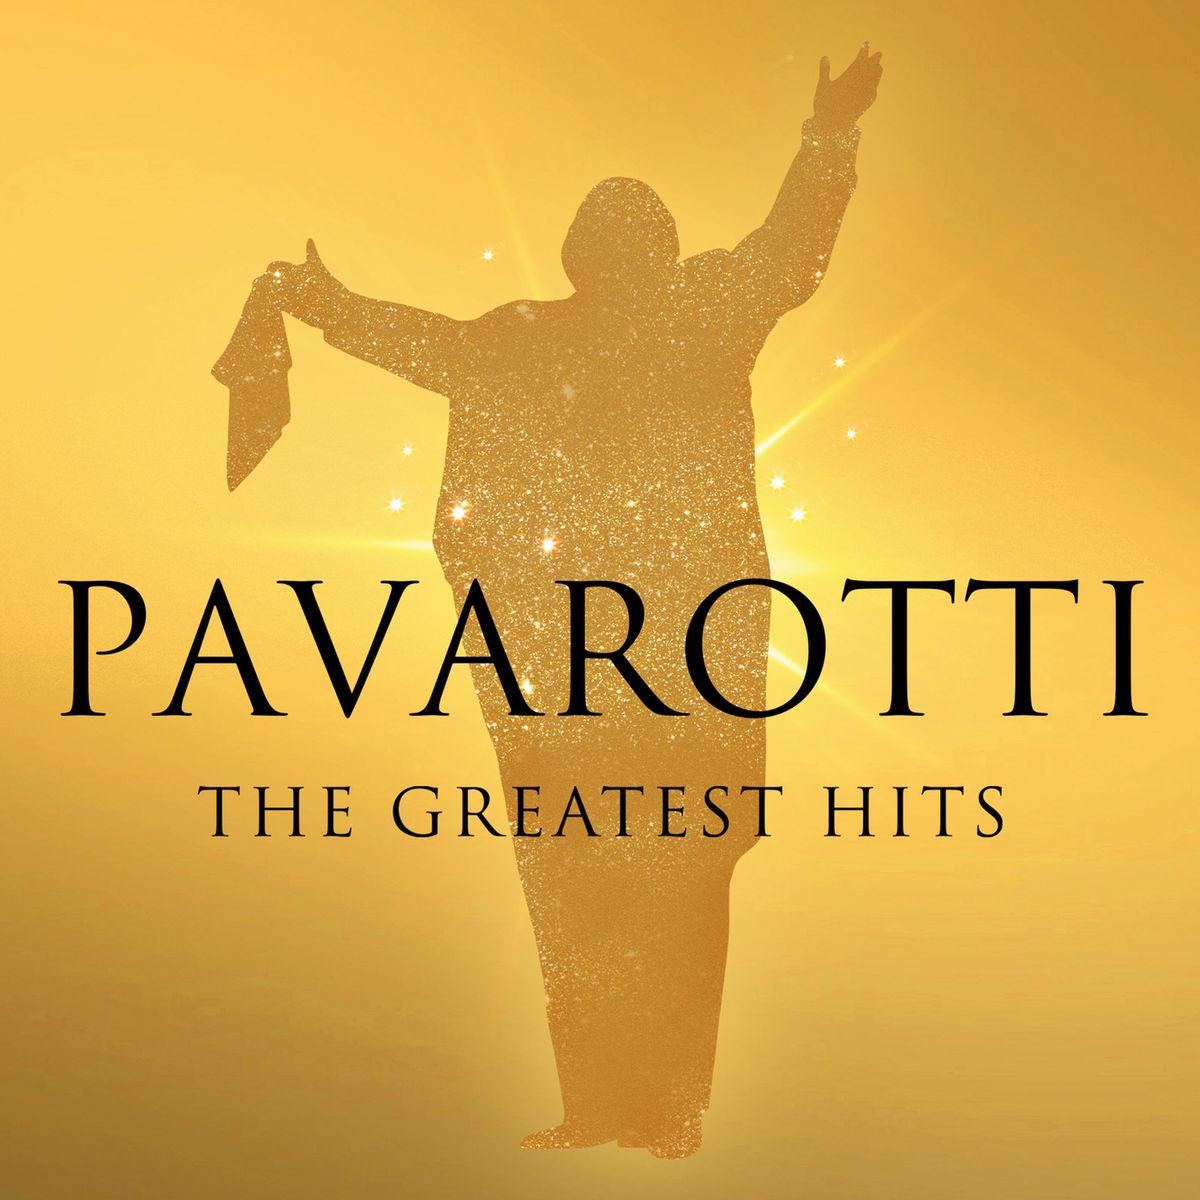 Luciano Pavarotti - Pavarotti - The Greatest Hits (2019)